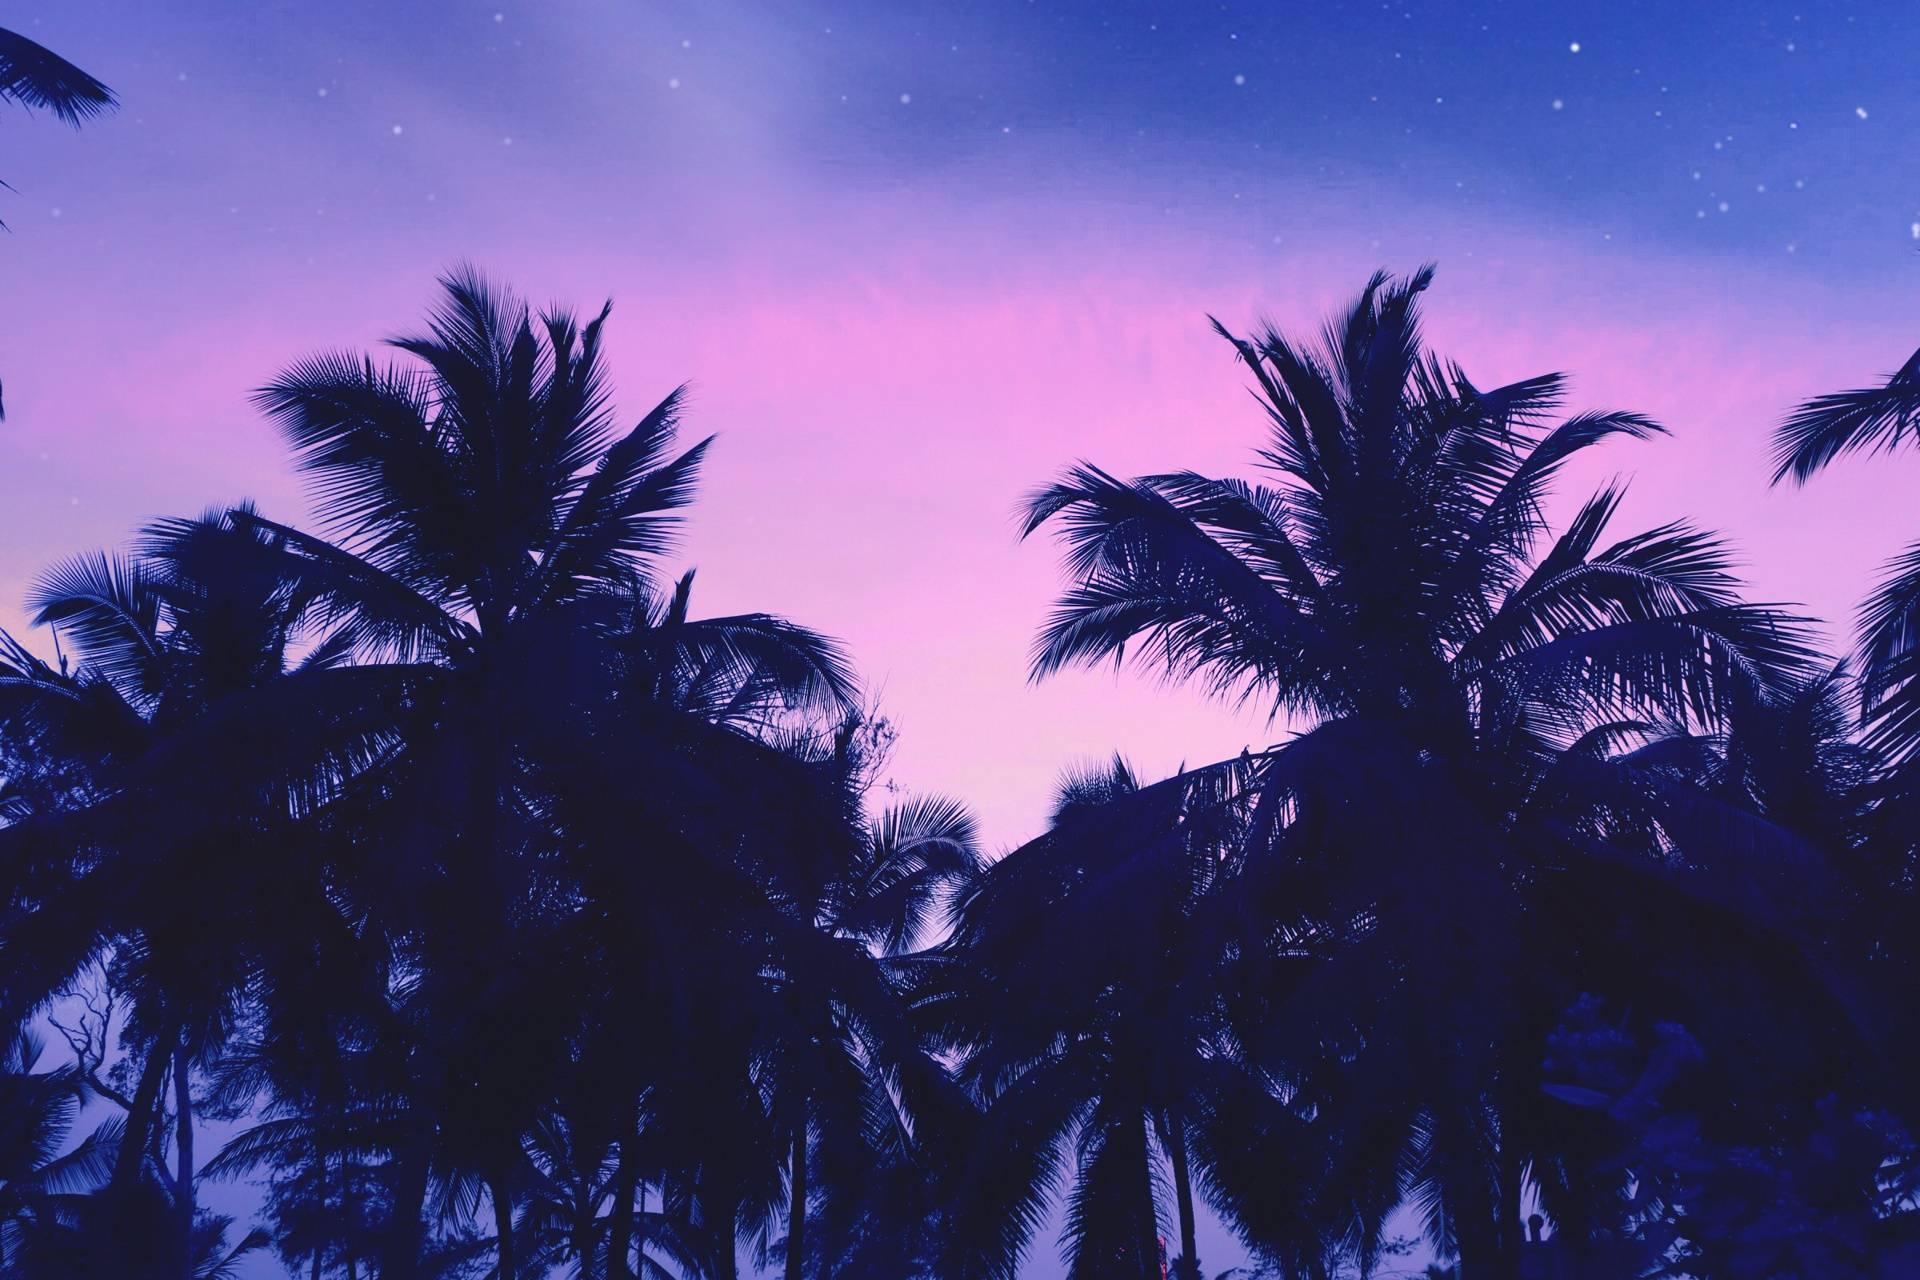 Night is peaceful